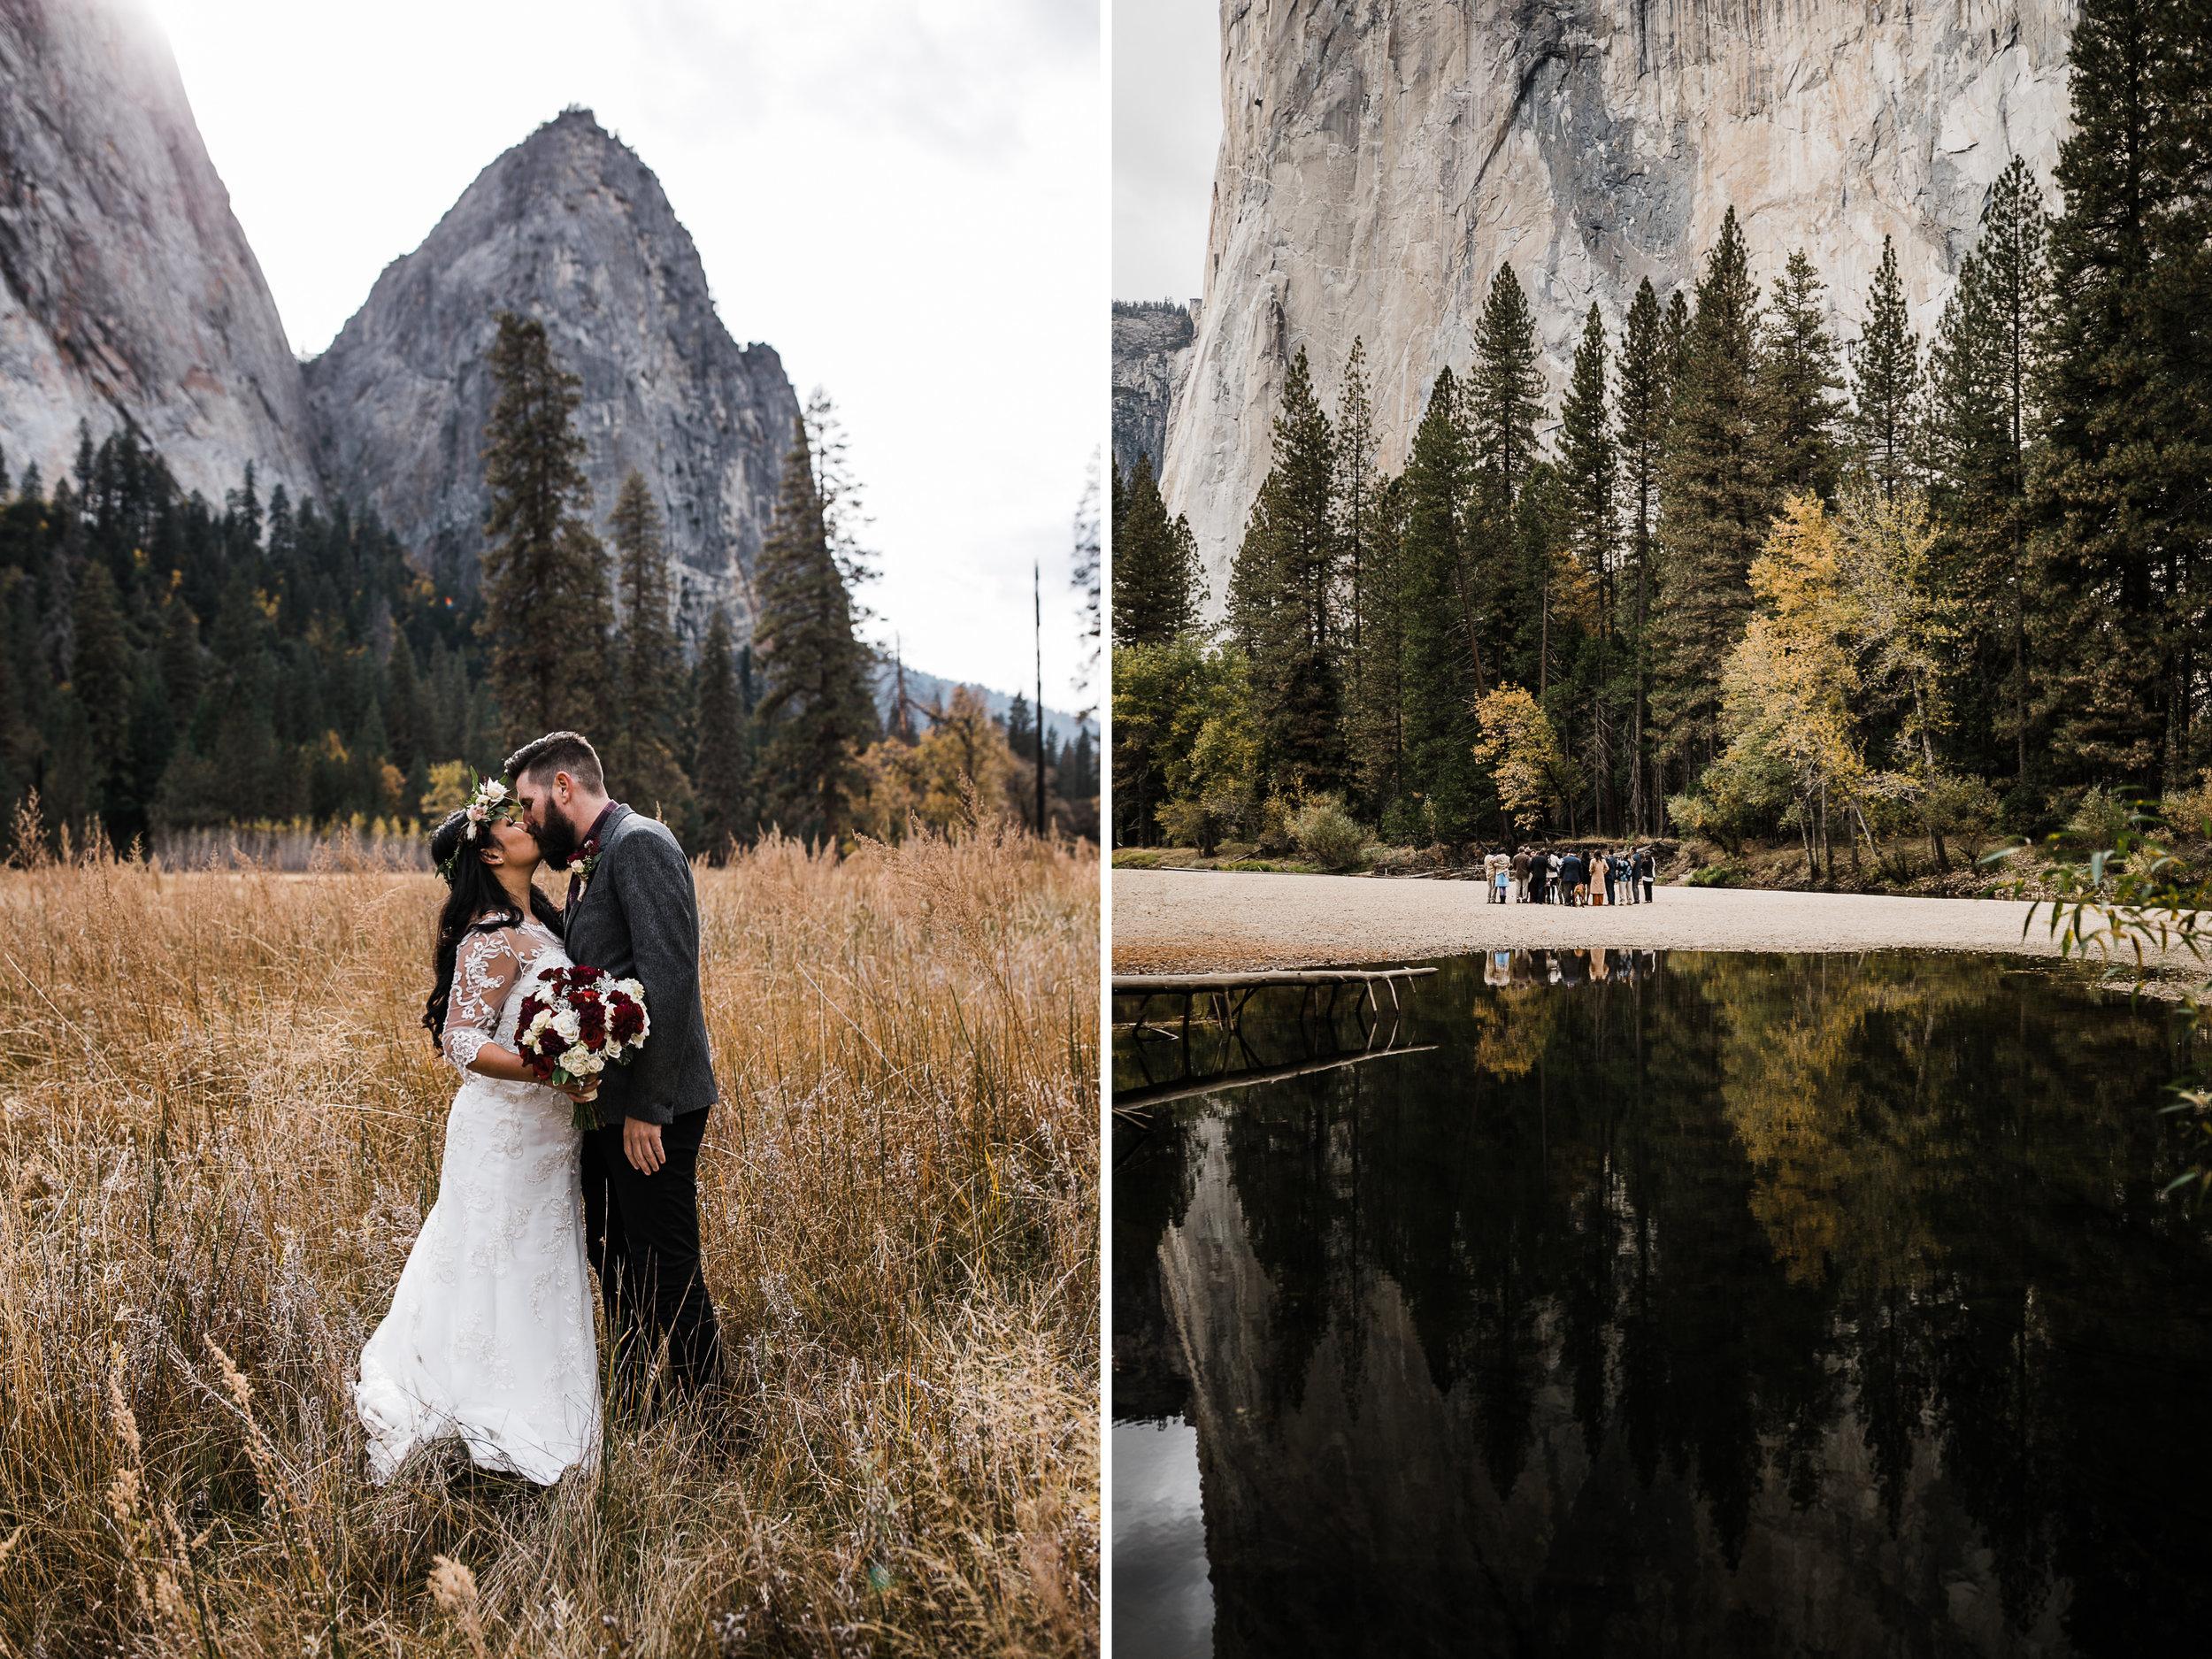 intimate fall wedding day in yosemite national park | destination adventure wedding photographers | the hearnes adventure photography | www.thehearnes.com